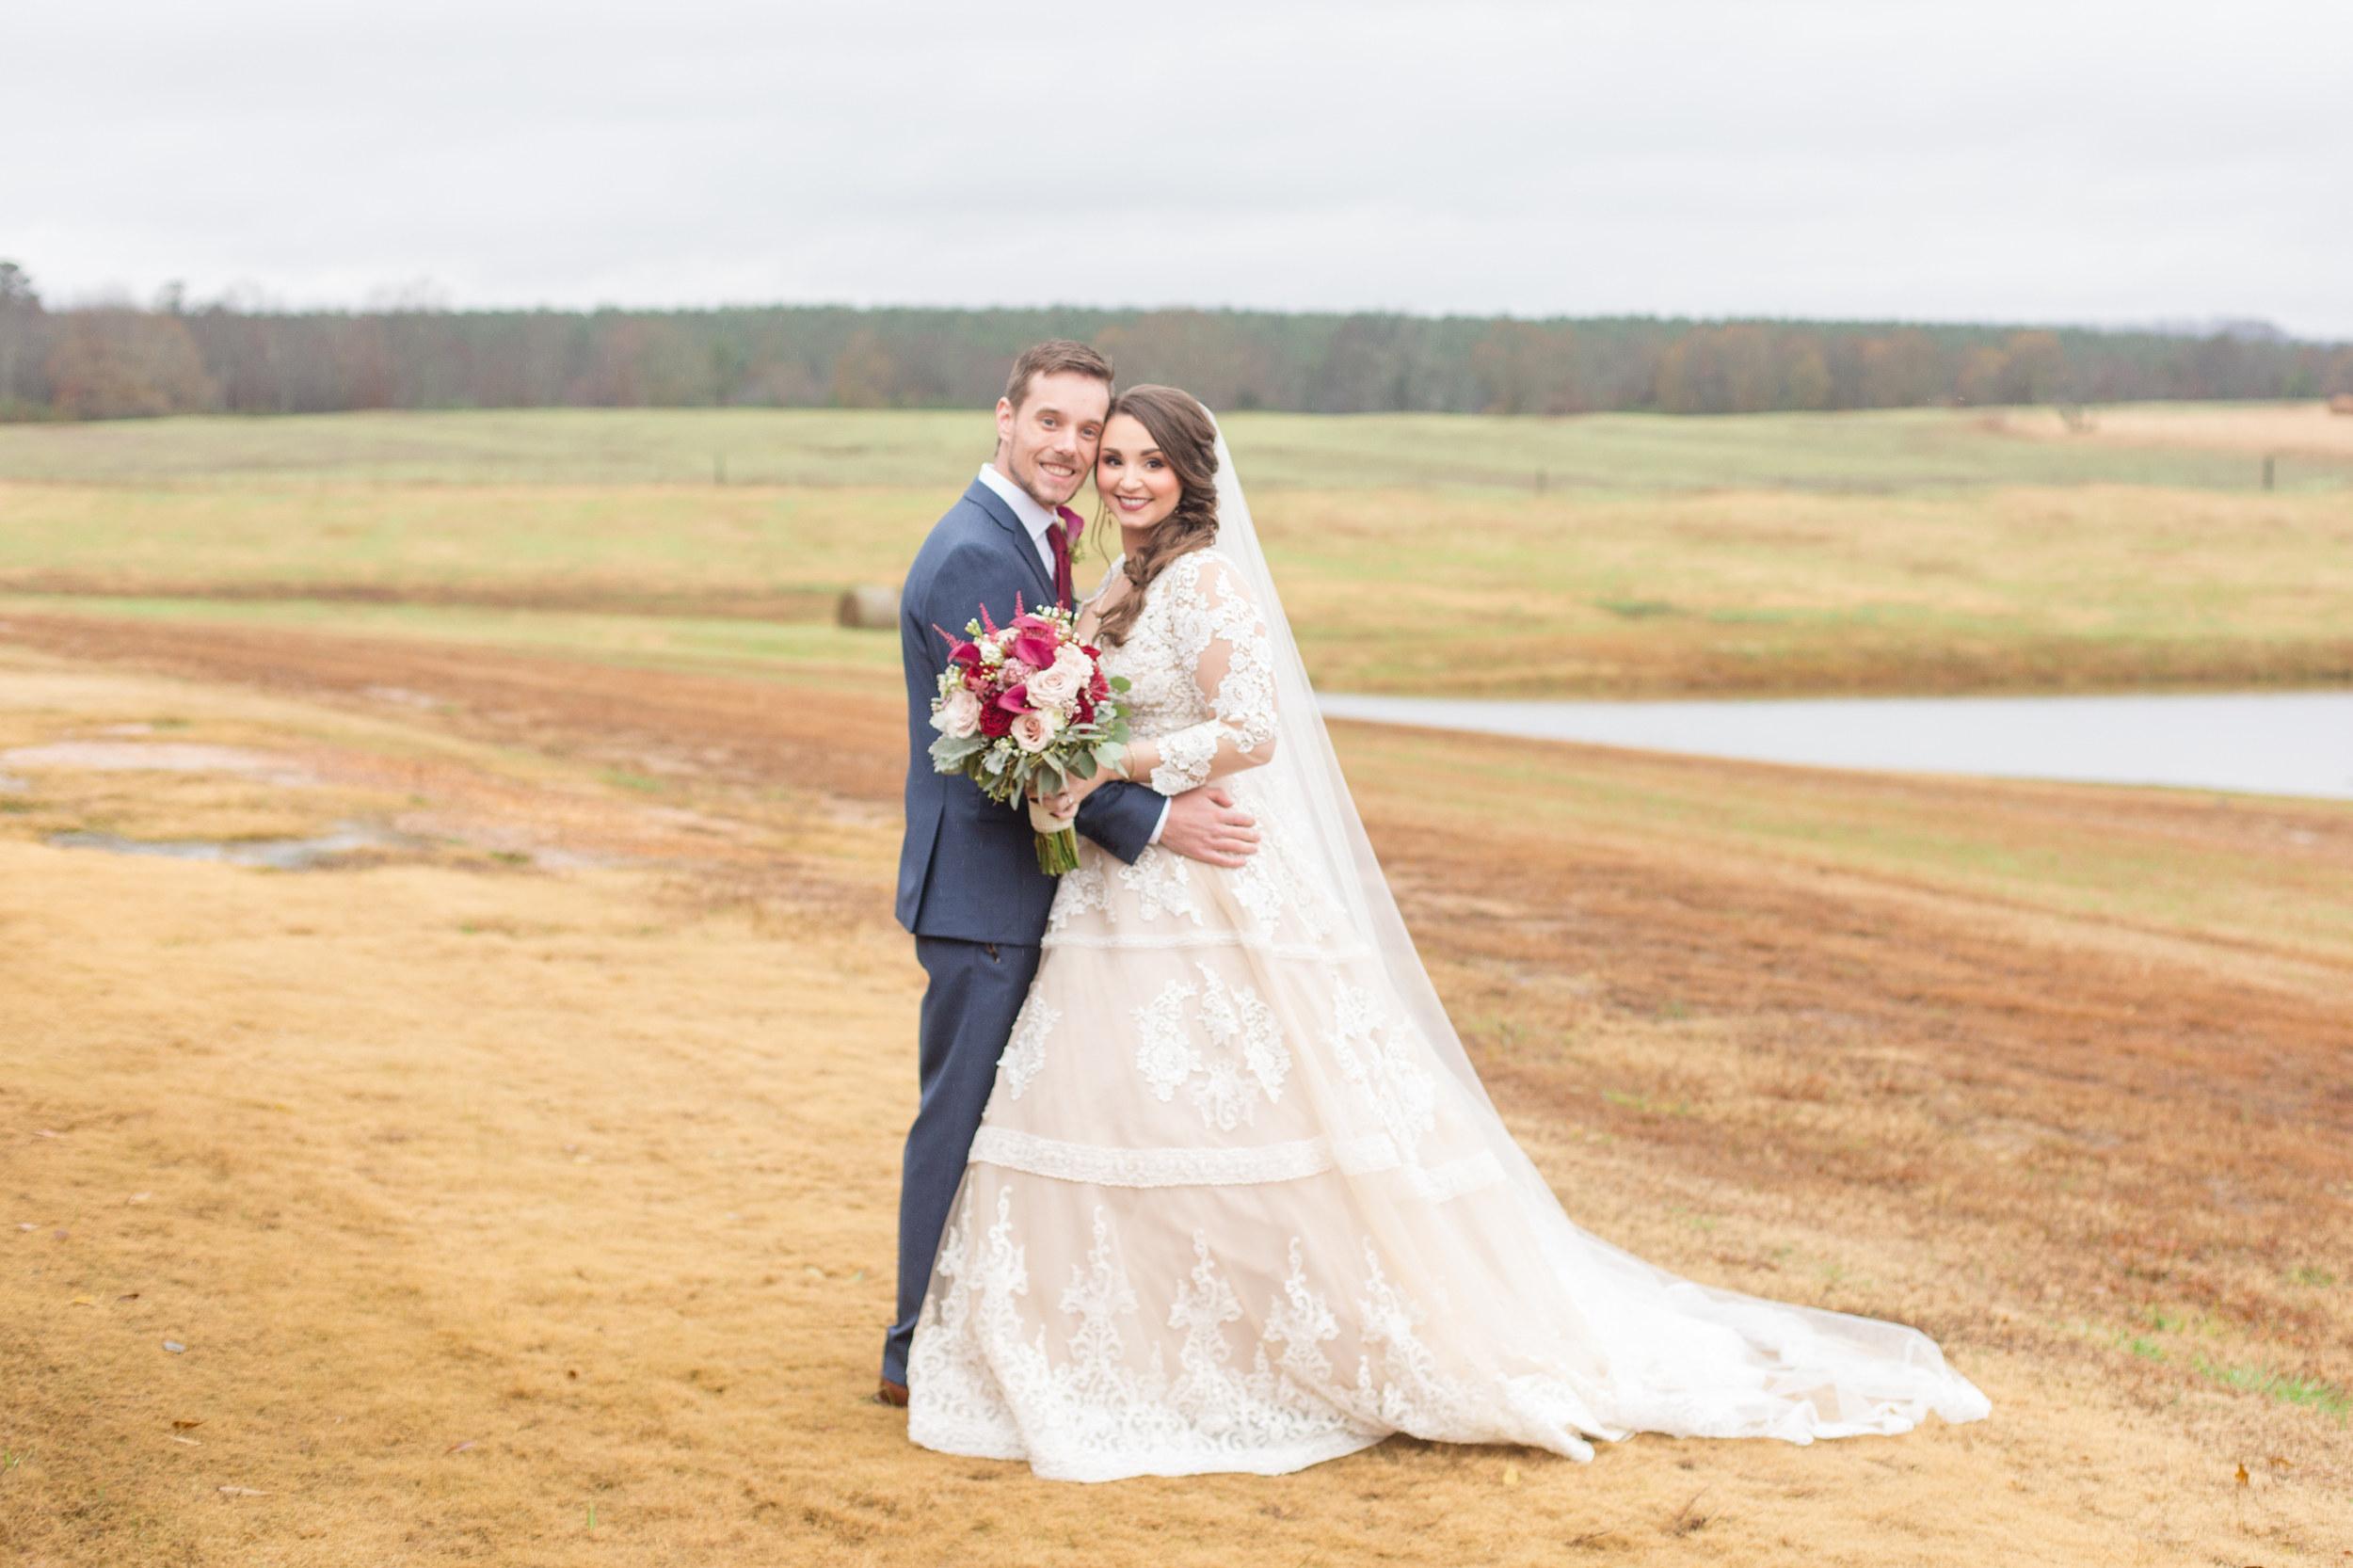 Randy Fenoli Bride - Crissa & Alex